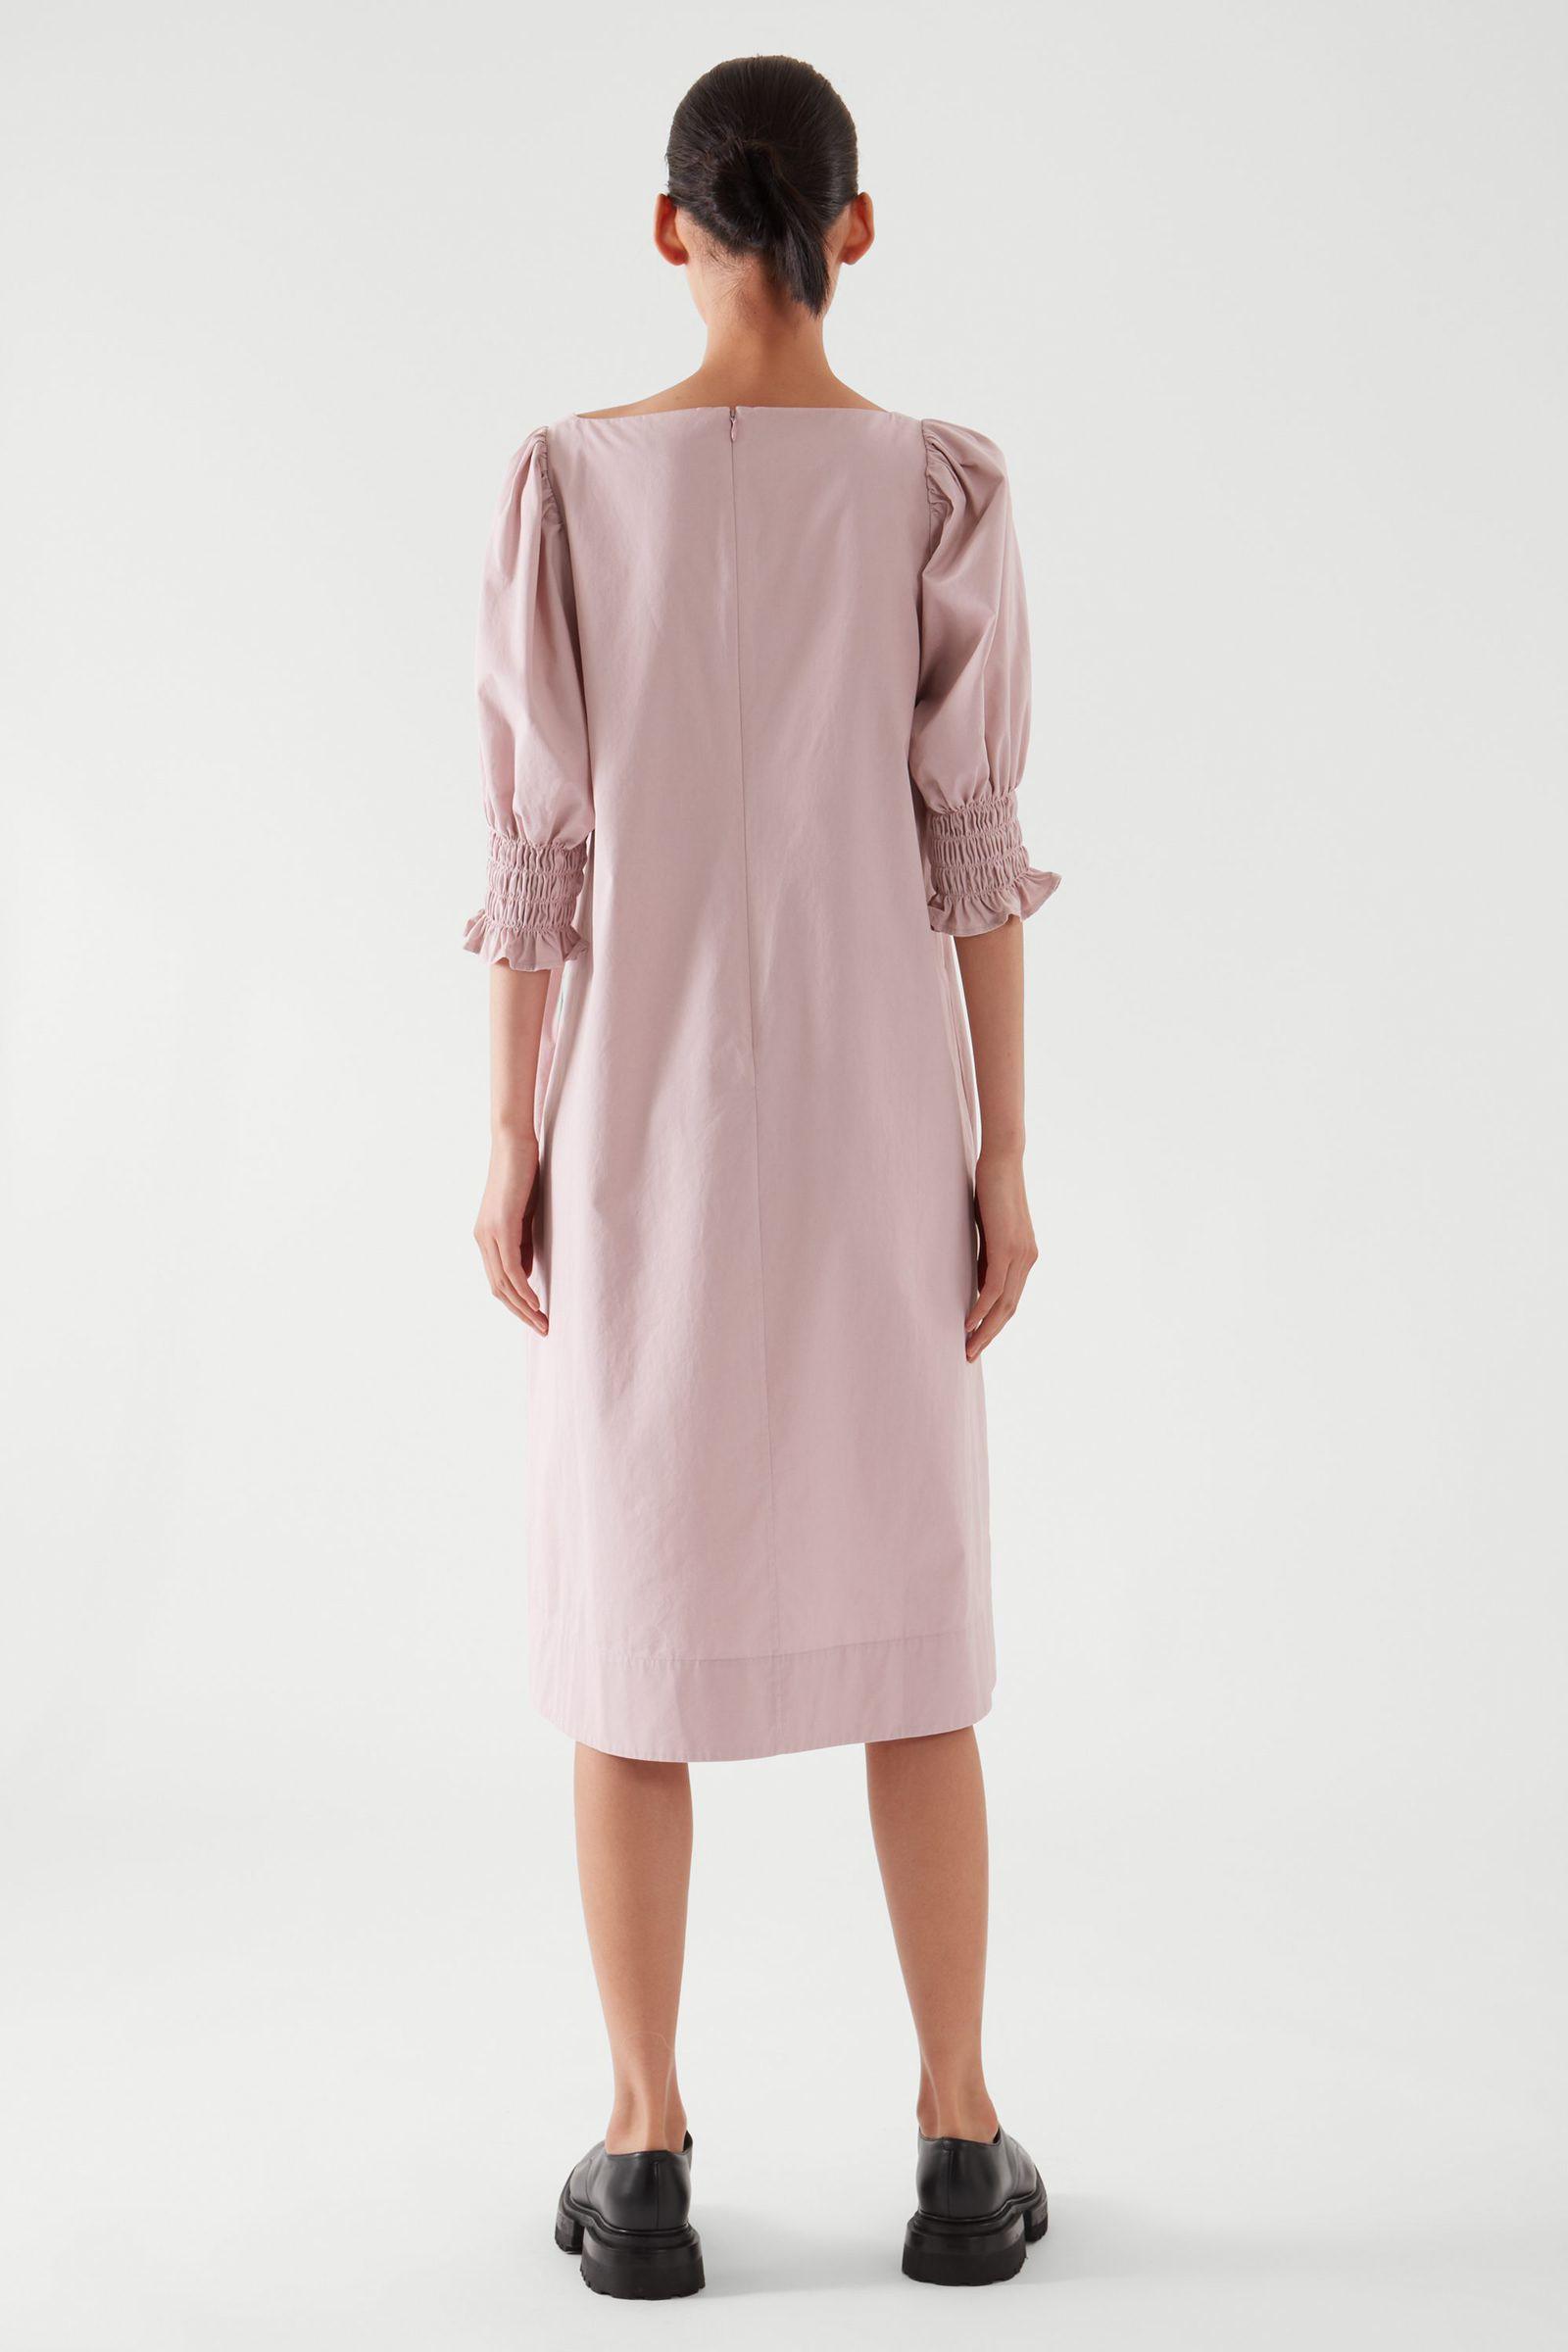 COS 스퀘어 넥 스모킹 드레스의 더스티 핑크컬러 ECOMLook입니다.